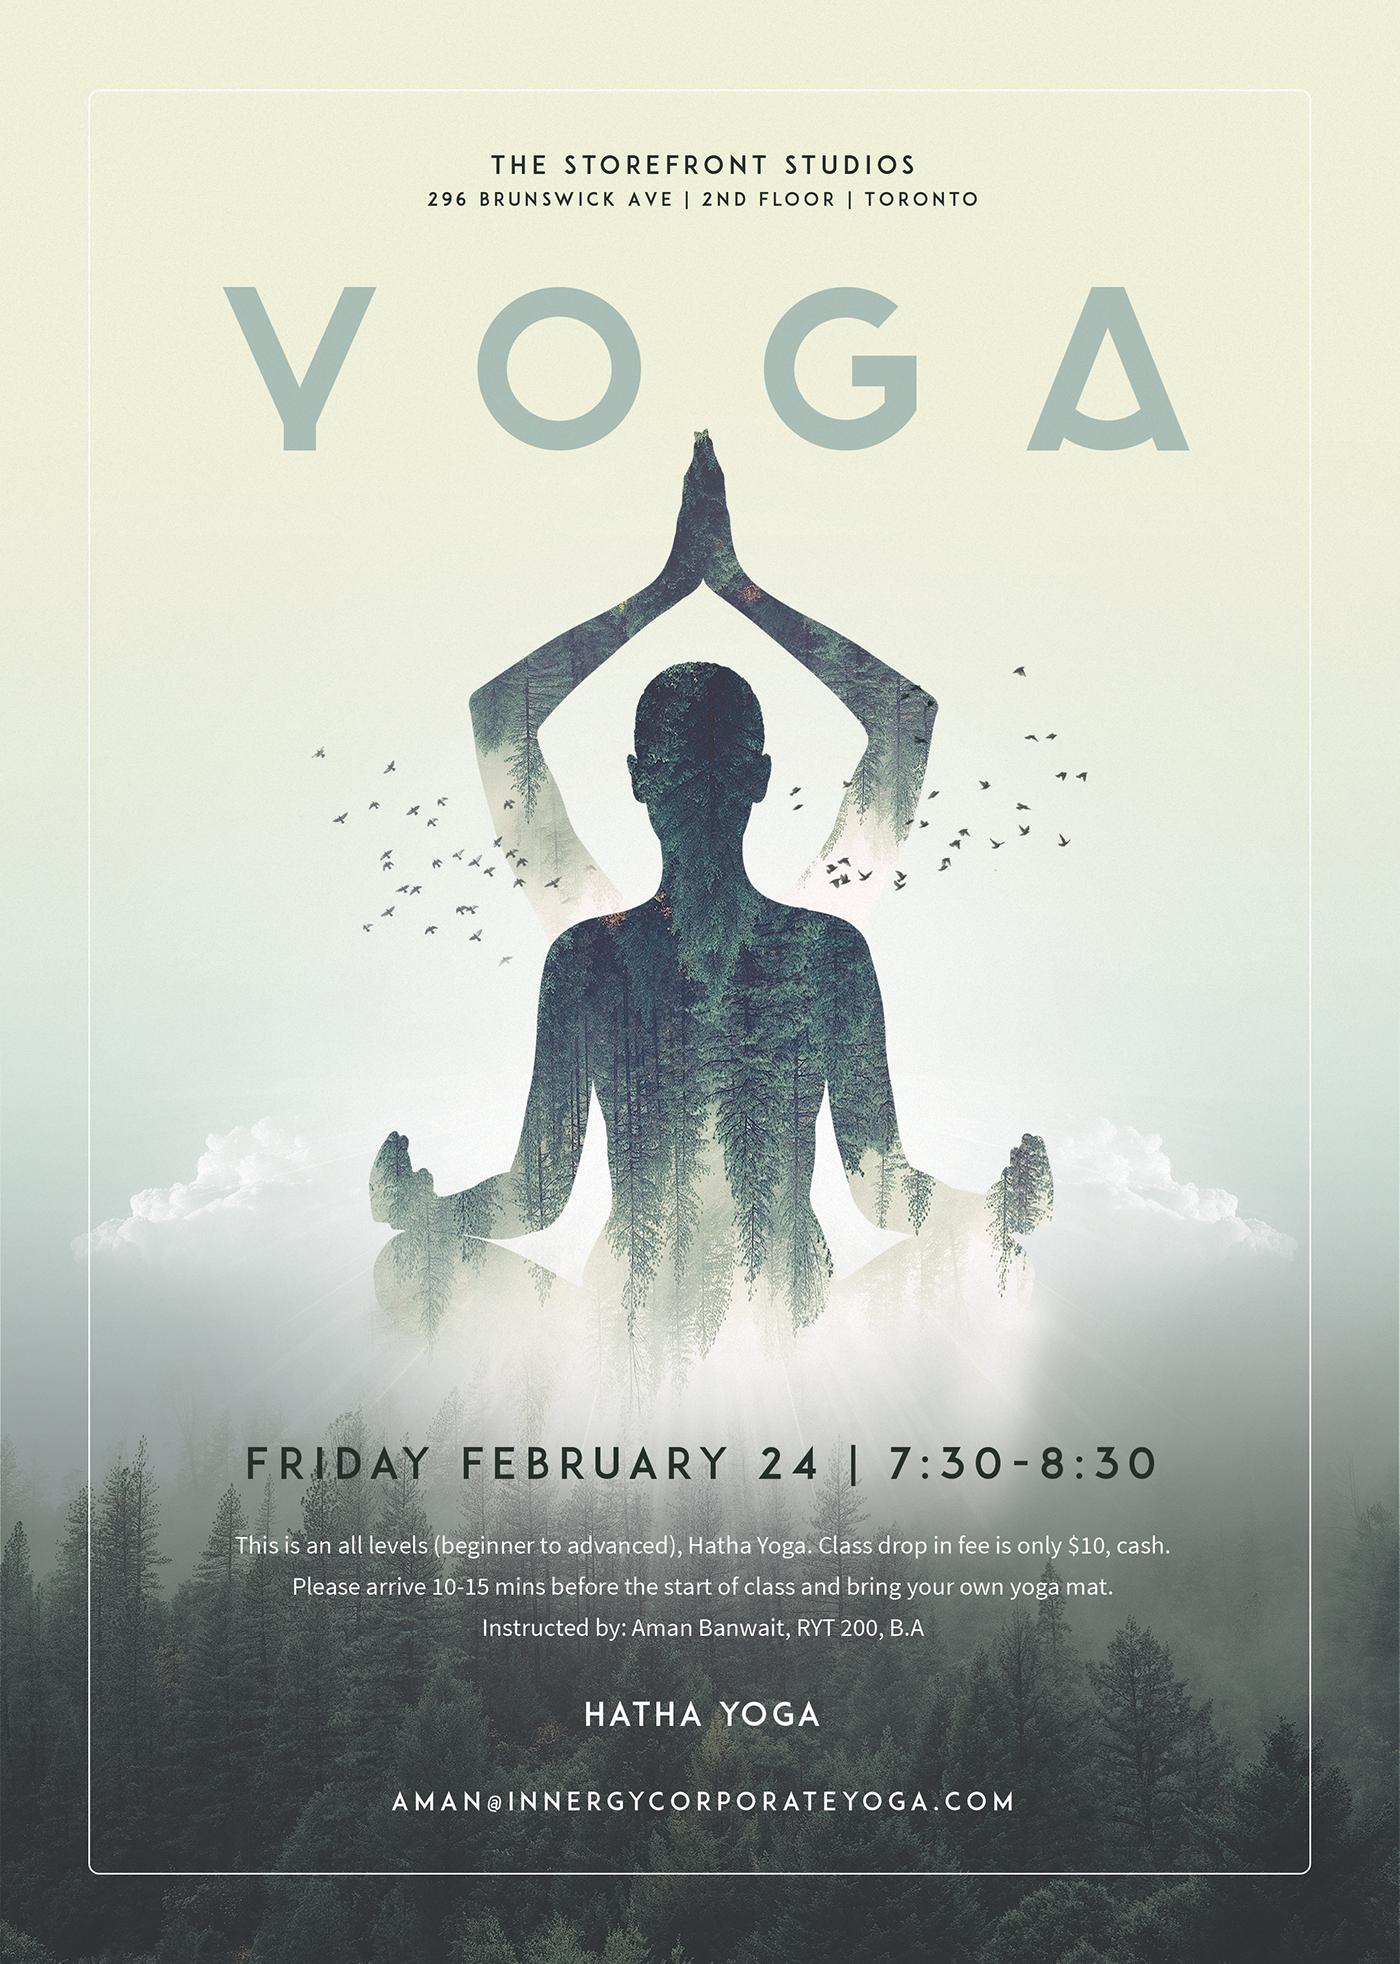 Hatha Yoga Digital Poster Design